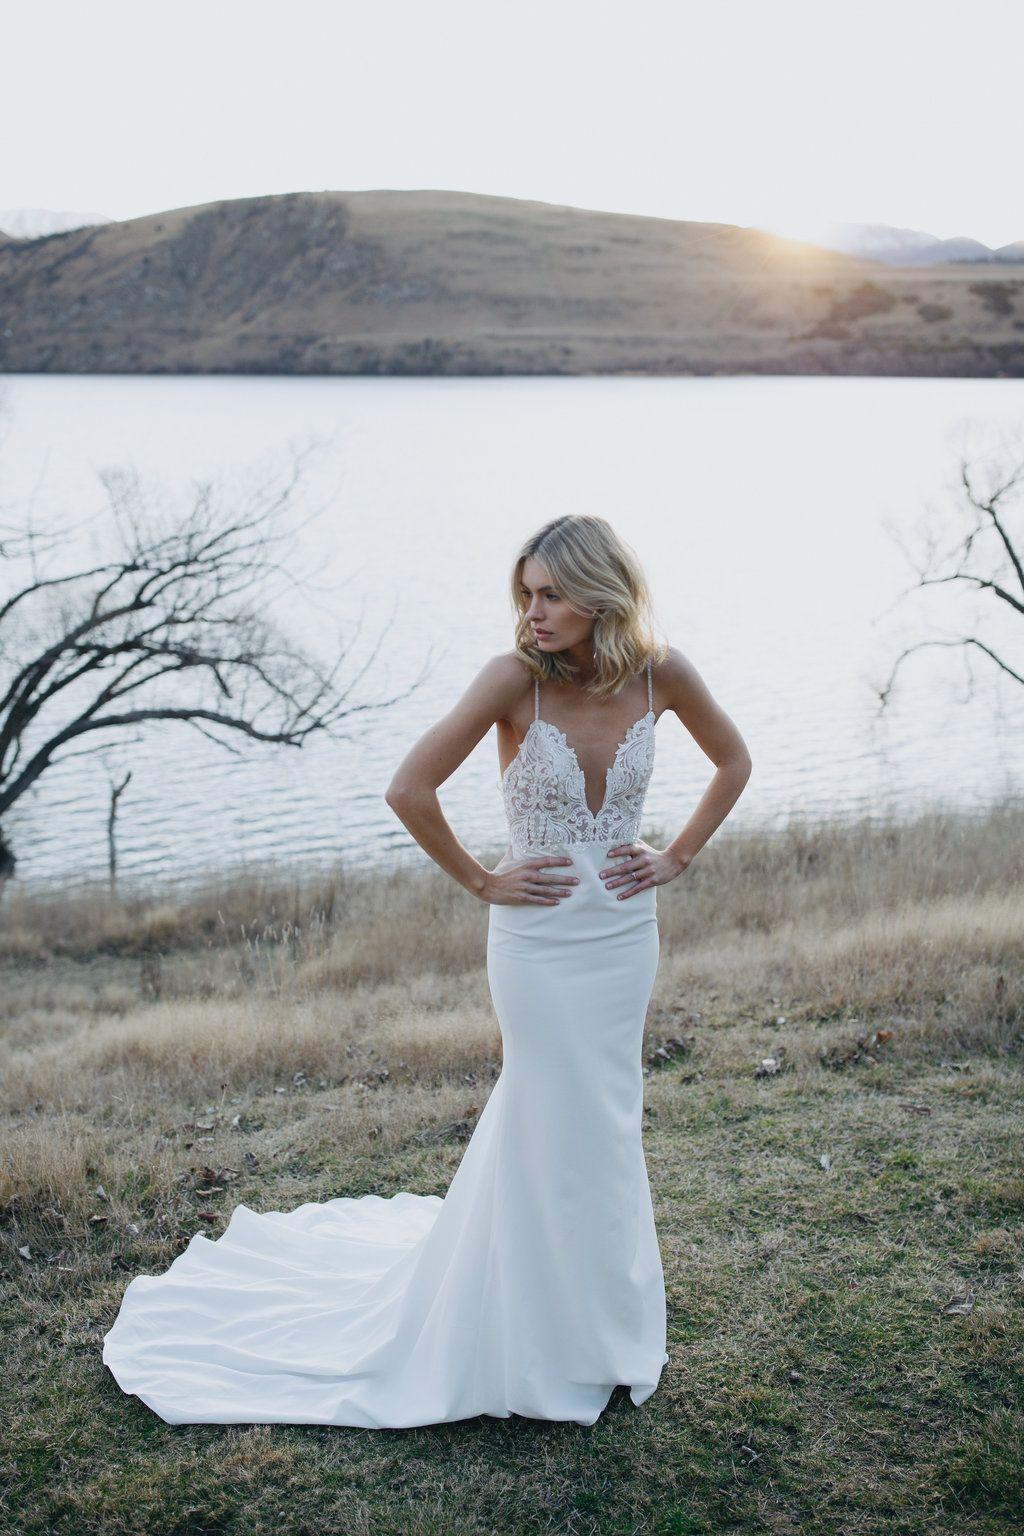 Sienna: every boho bride's dream. 'Nuff said.